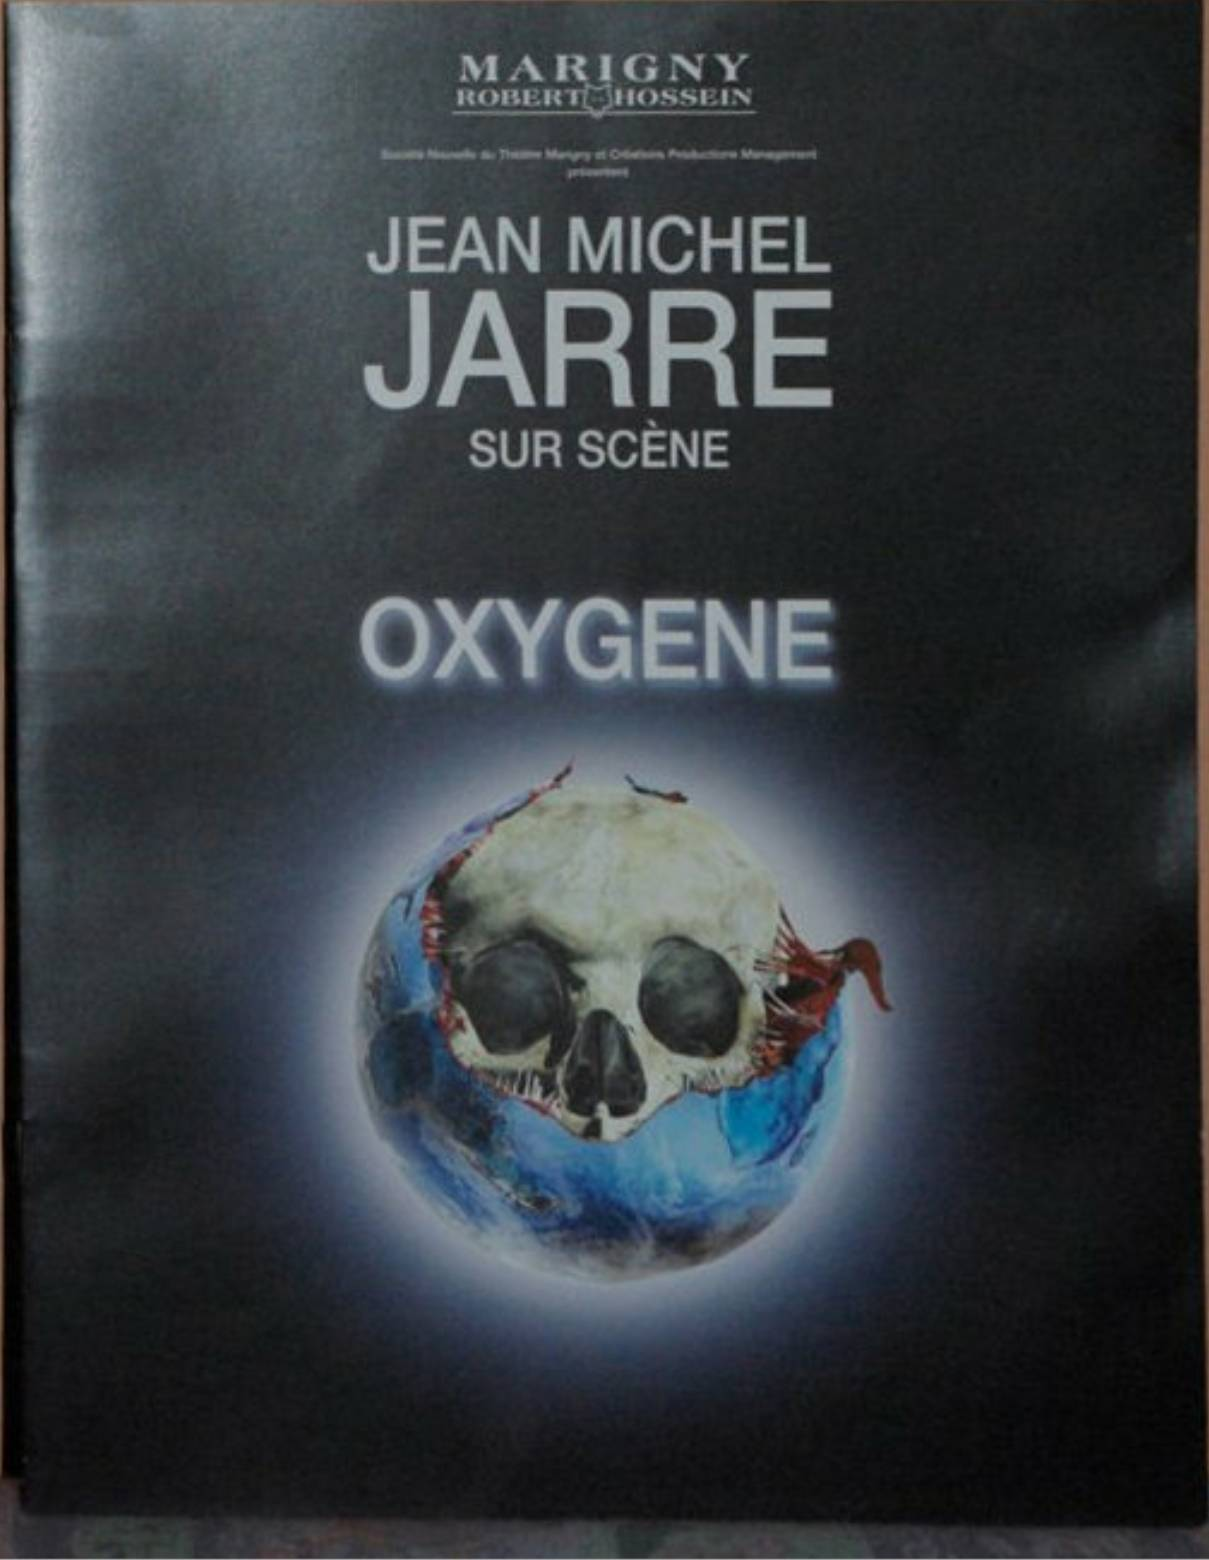 Oxygene Concert